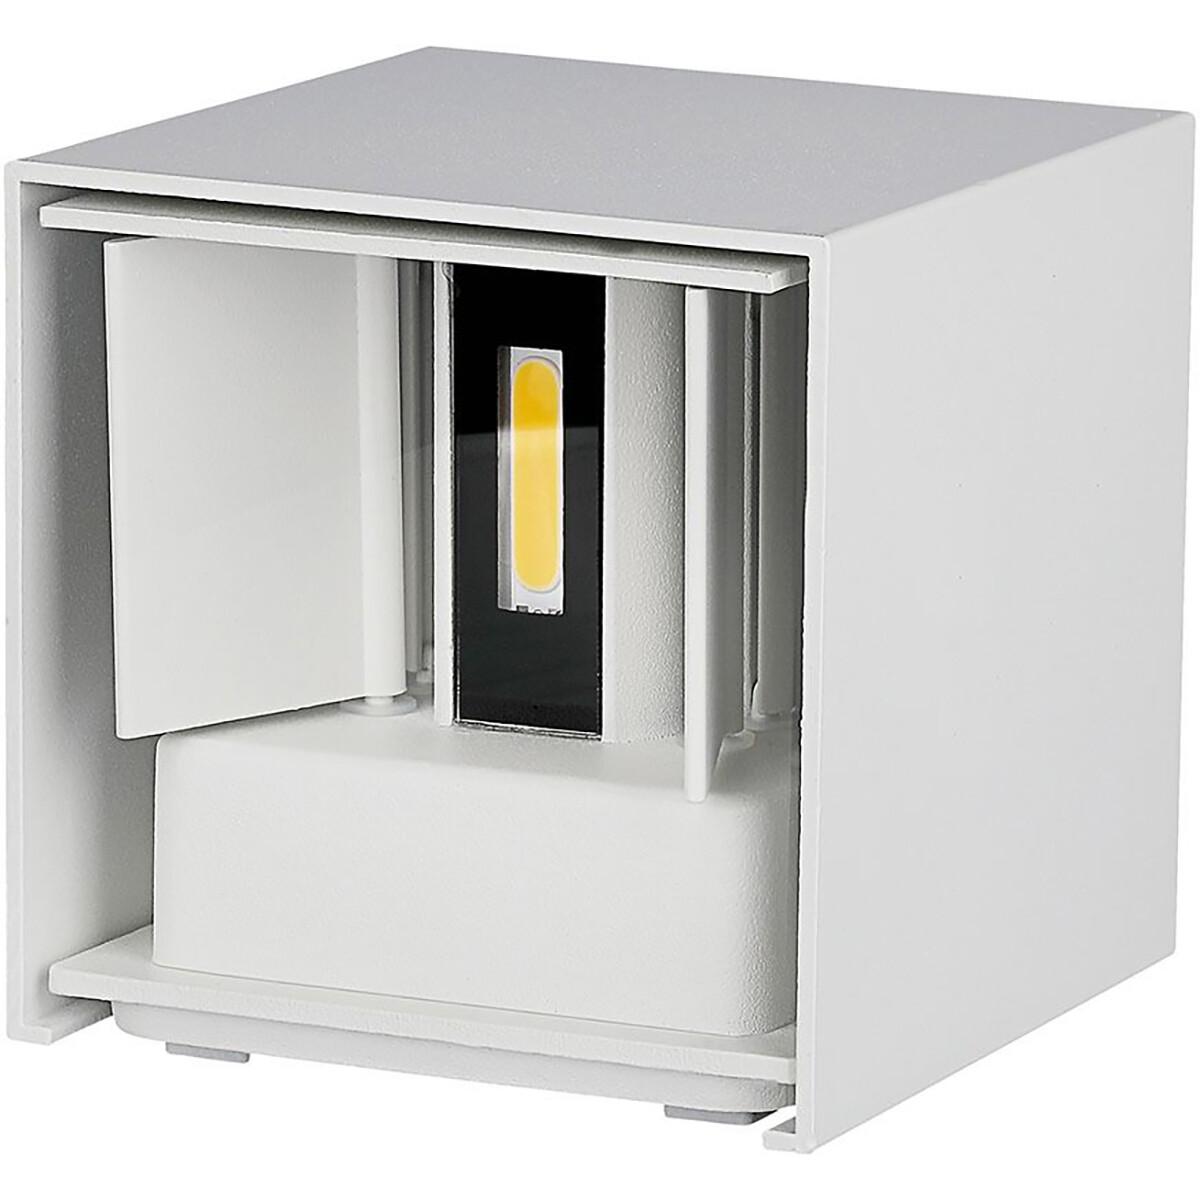 LED Tuinverlichting - Wandlamp - Viron Ultimo - 6W - Natuurlijk Wit 4000K - Vierkant - Mat Wit - Alu